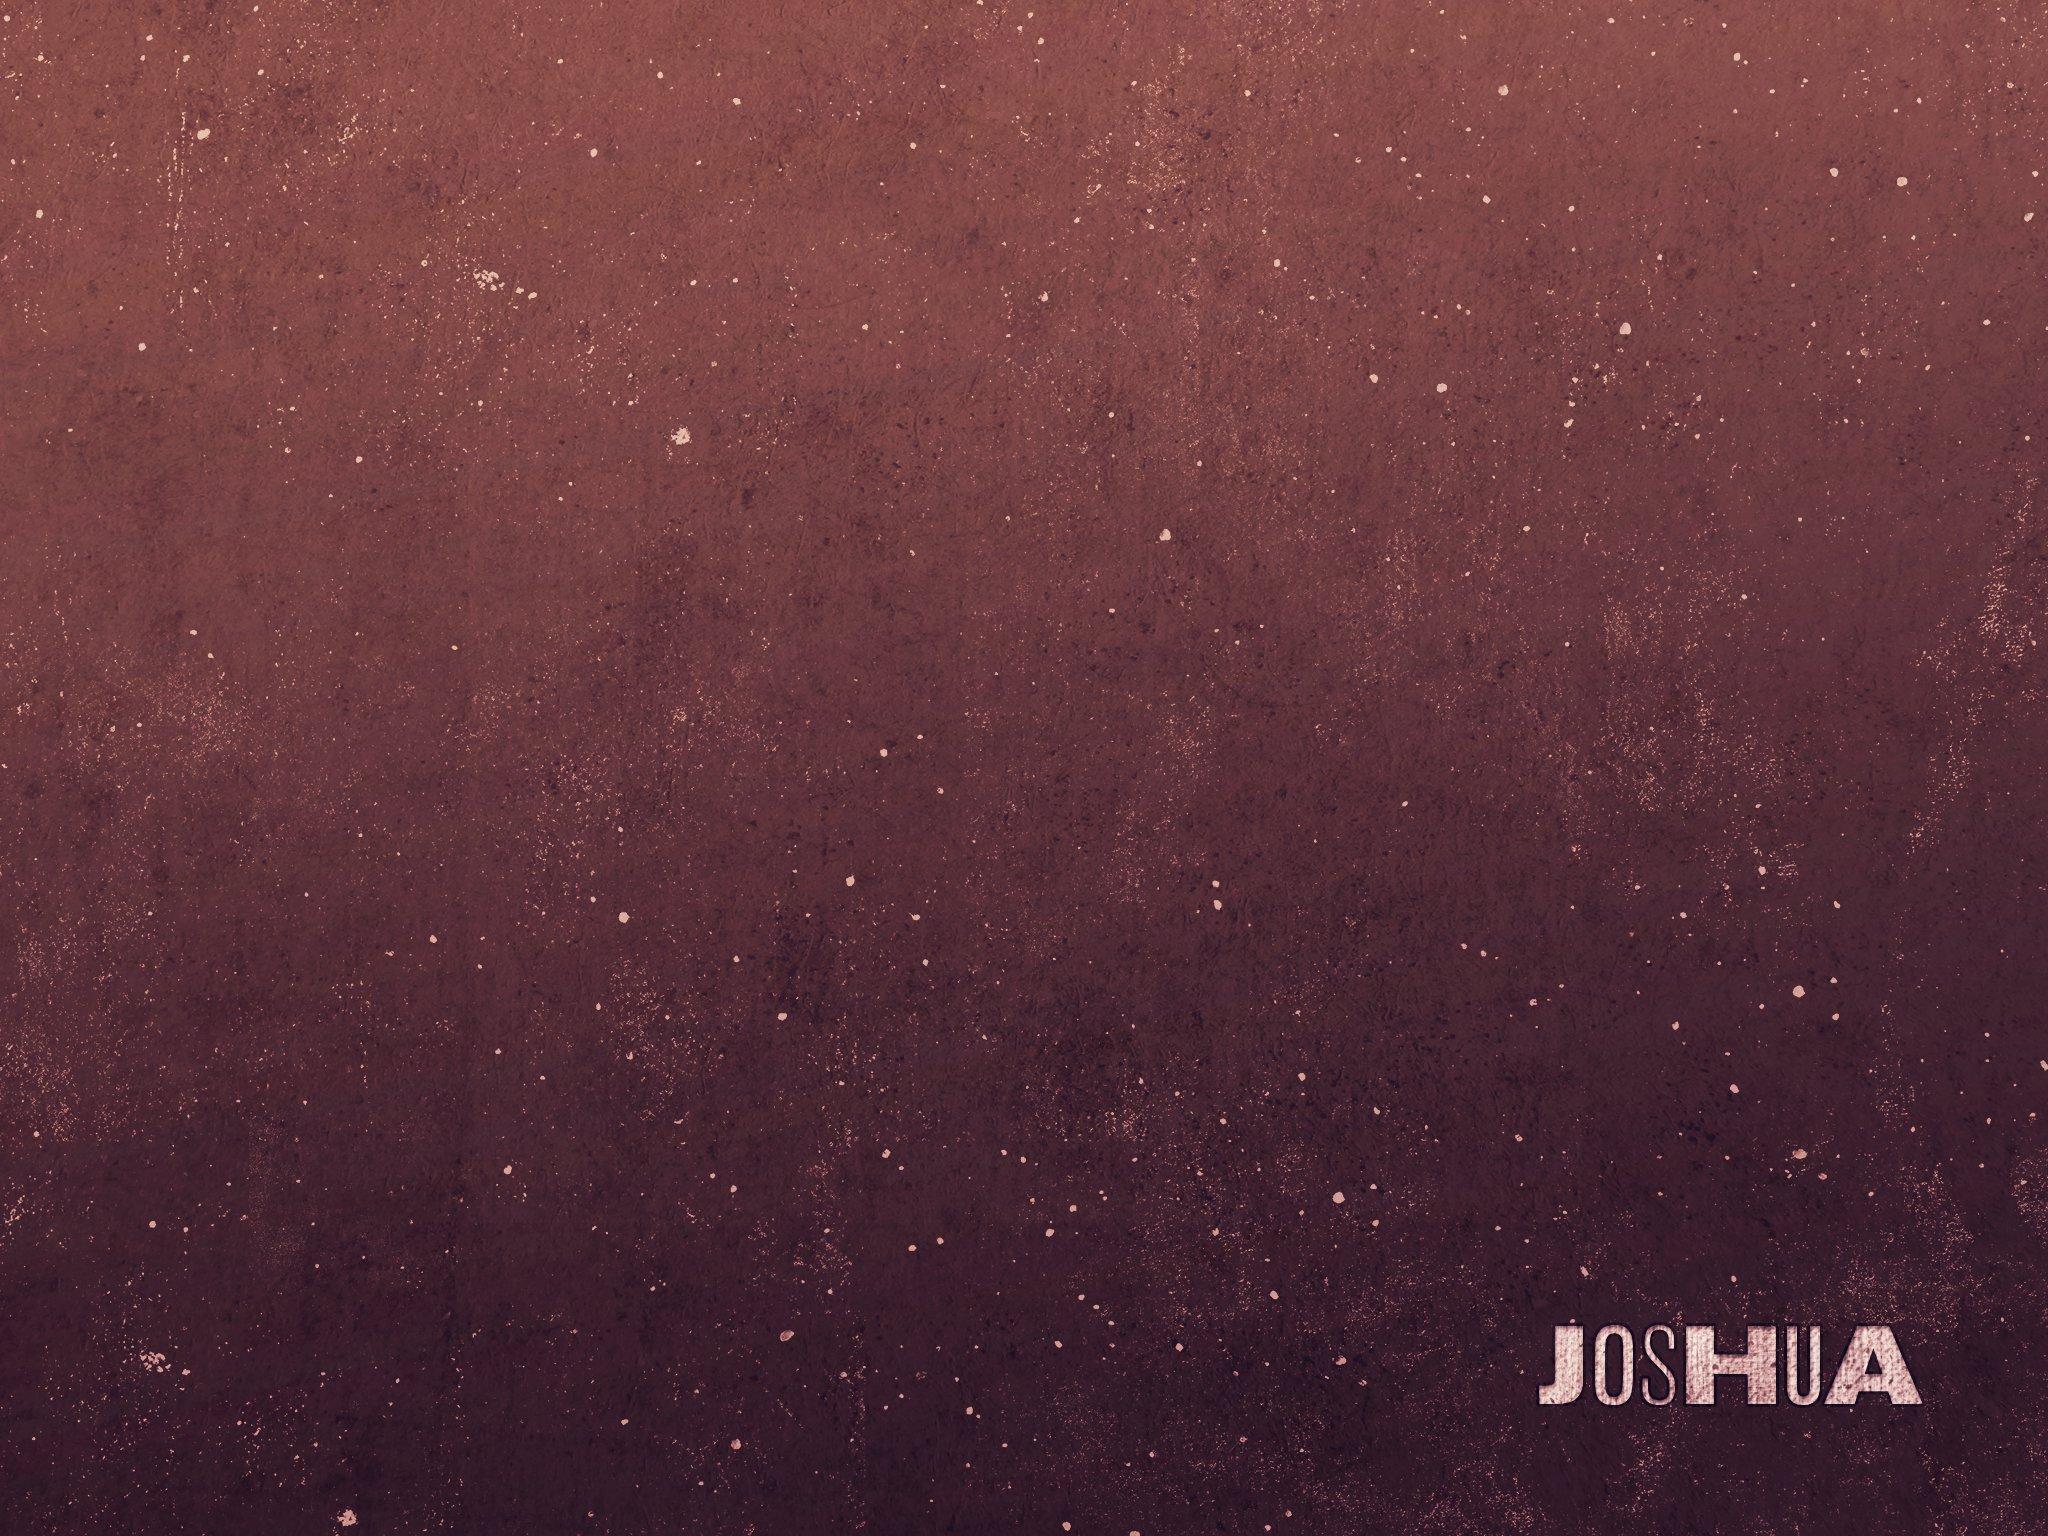 06-Joshua_Secondary_4x3-fullscreen.jpg